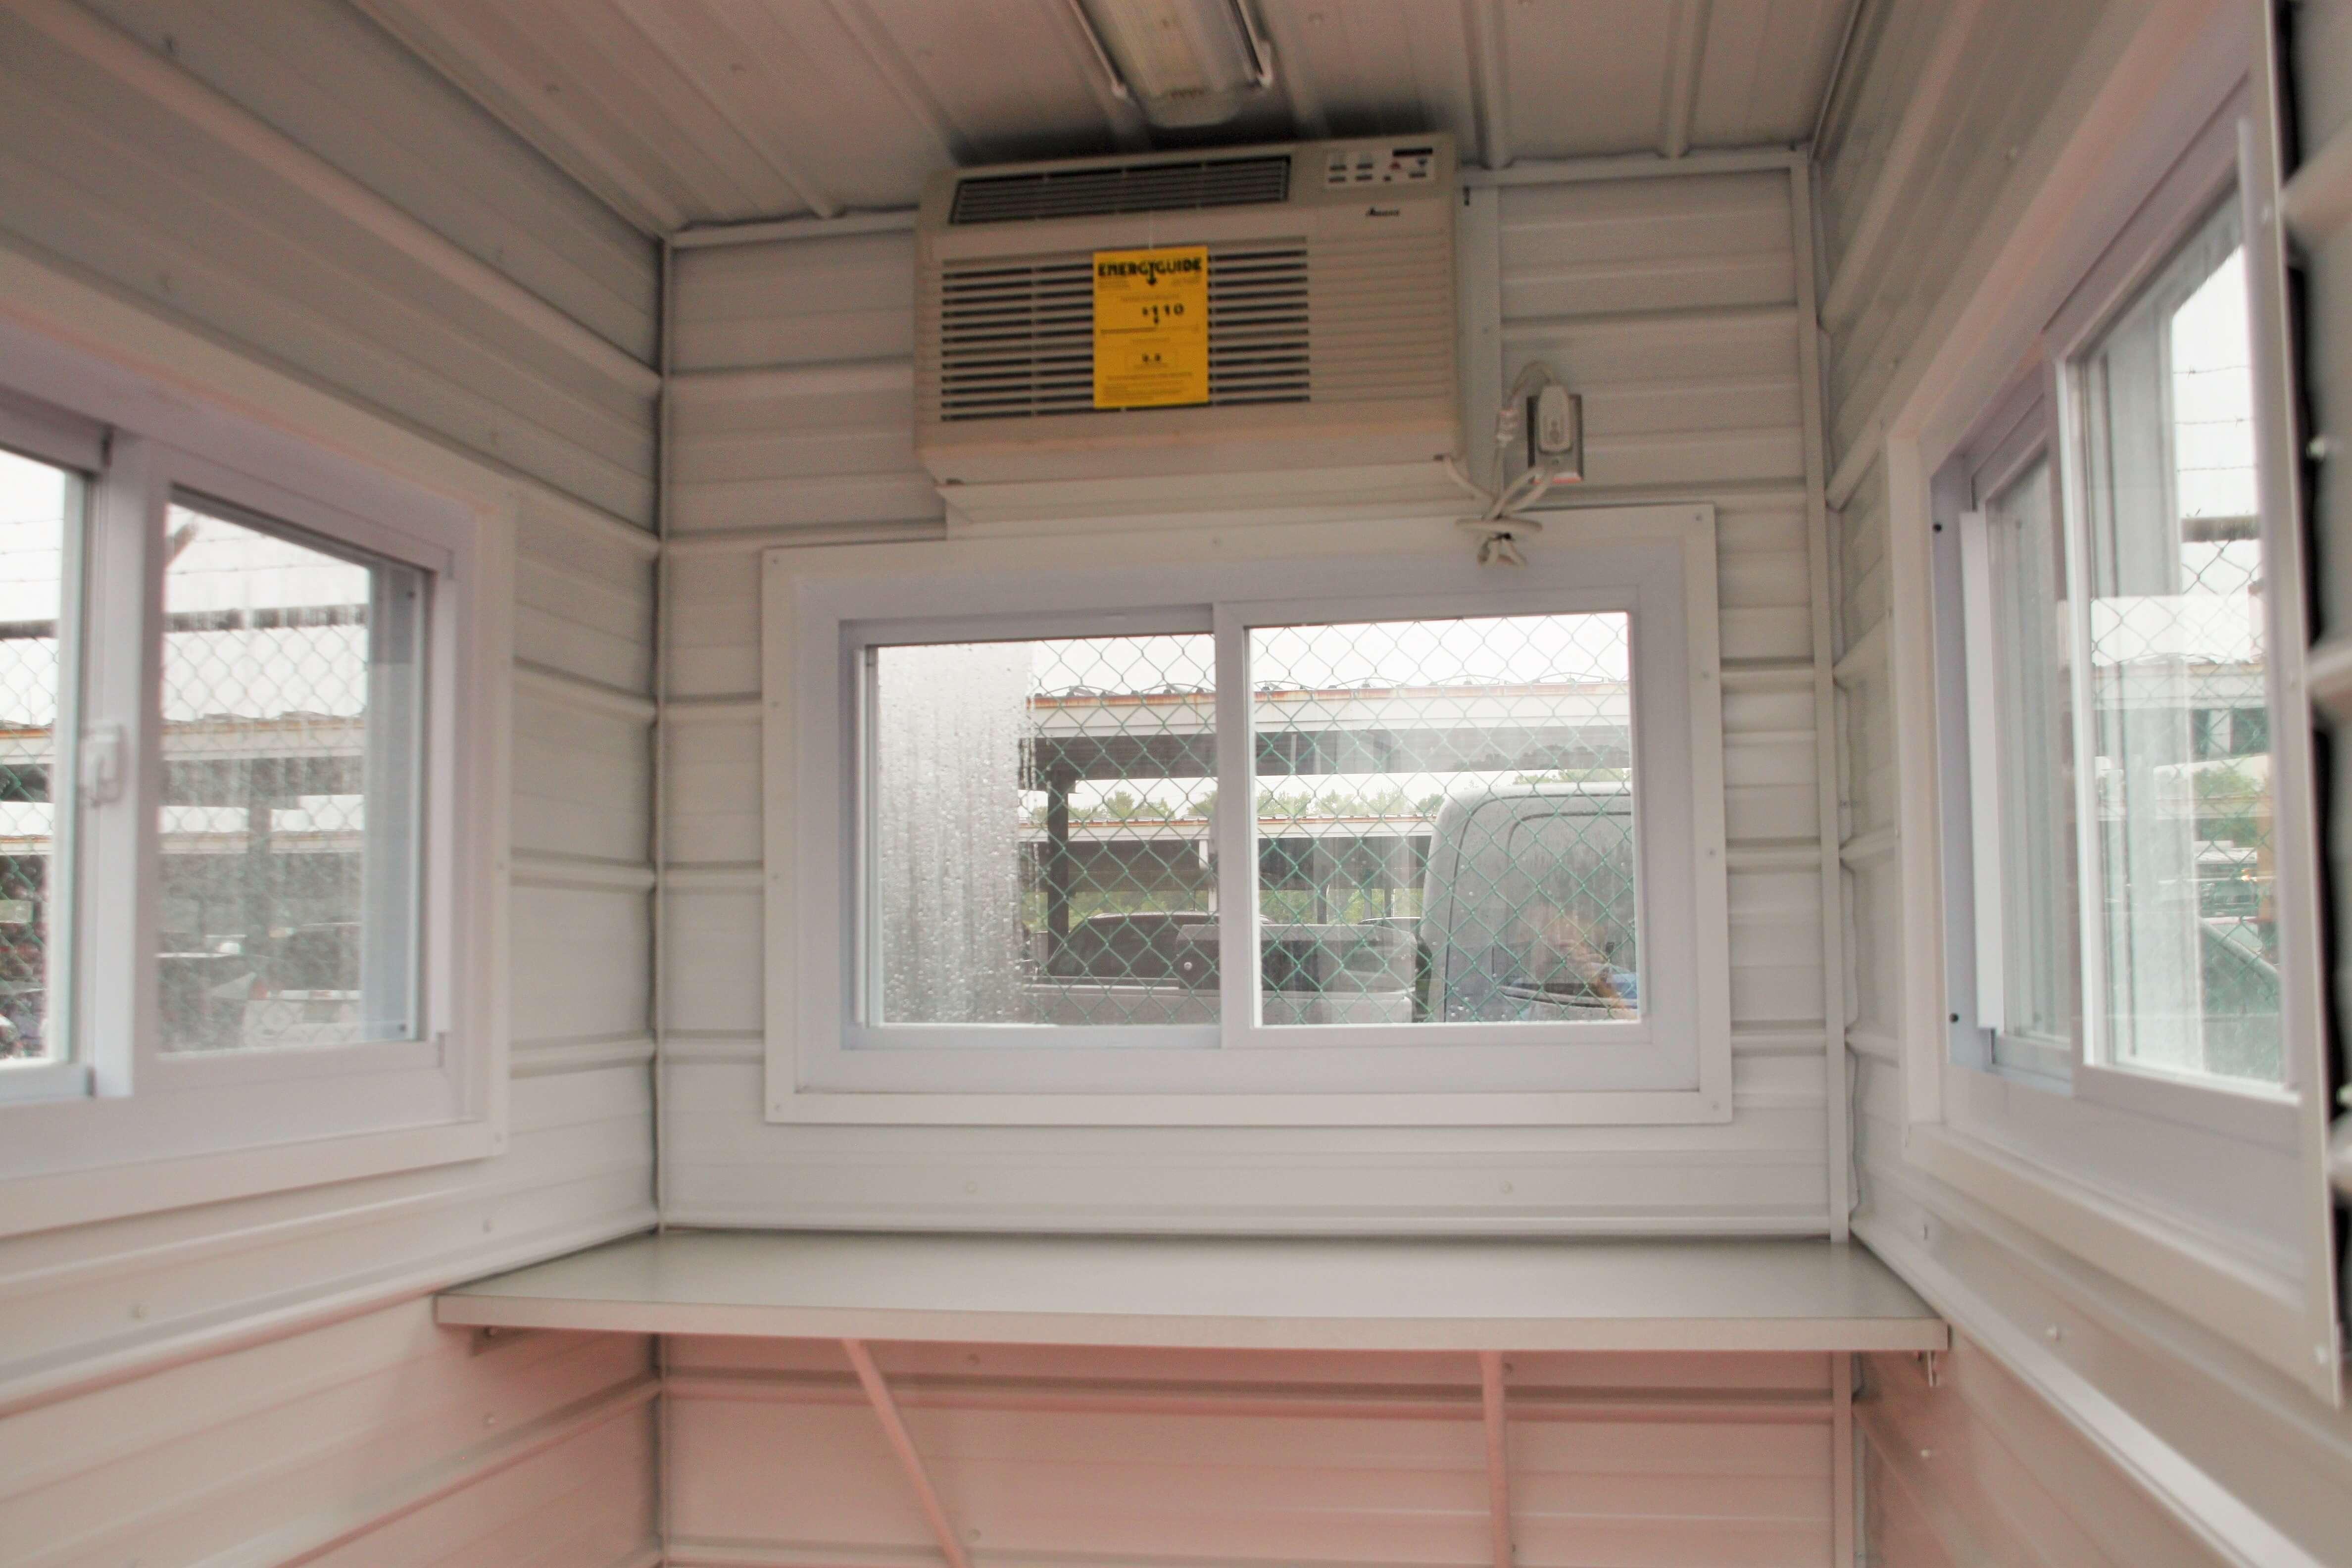 6 x 8 Guard booth, modular guard booth, modular guard house